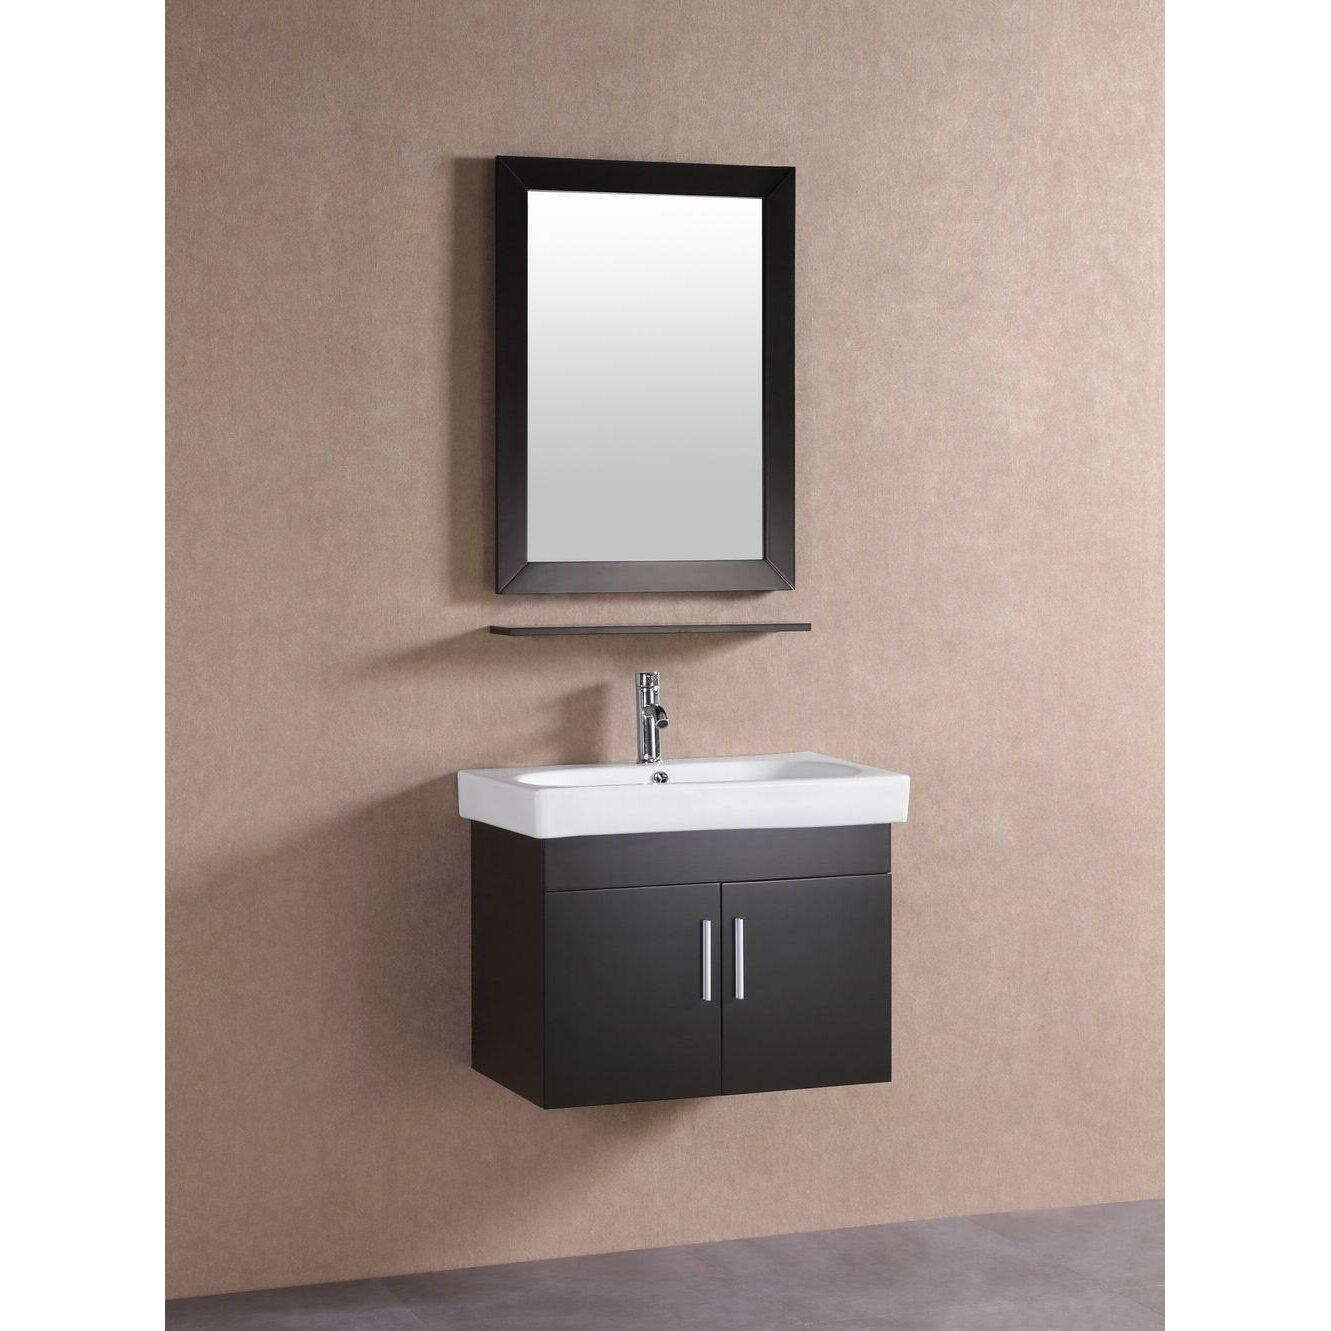 belvederebath 28 single modern bathroom vanity set. Black Bedroom Furniture Sets. Home Design Ideas